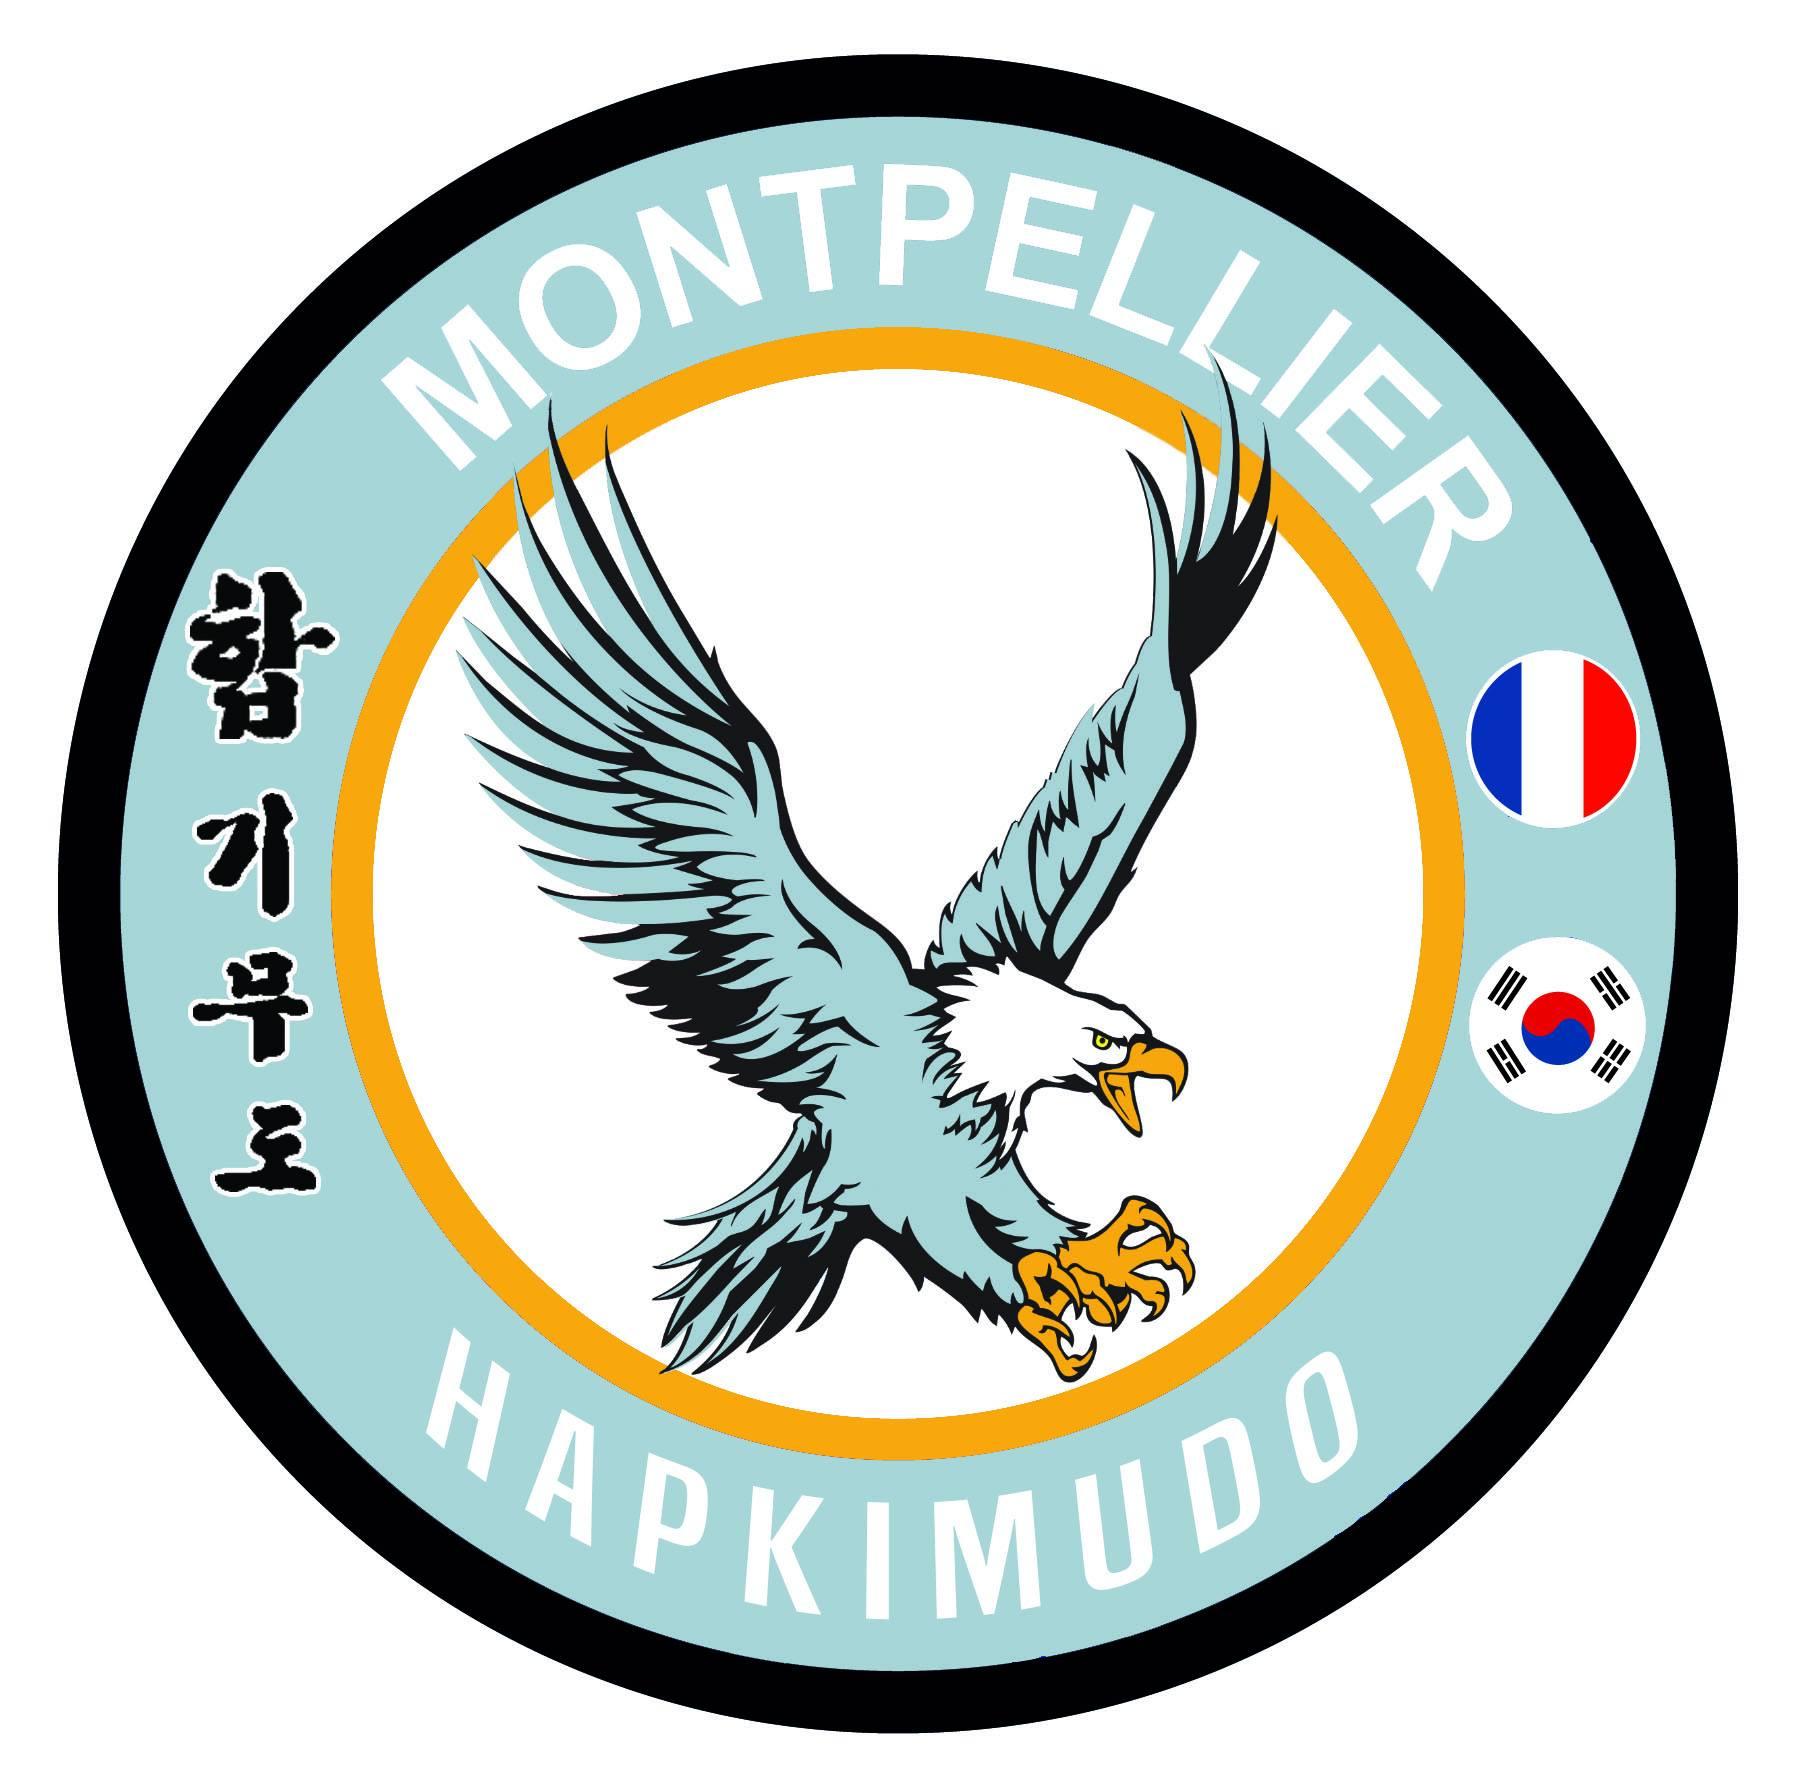 hapkimudo_montpellier